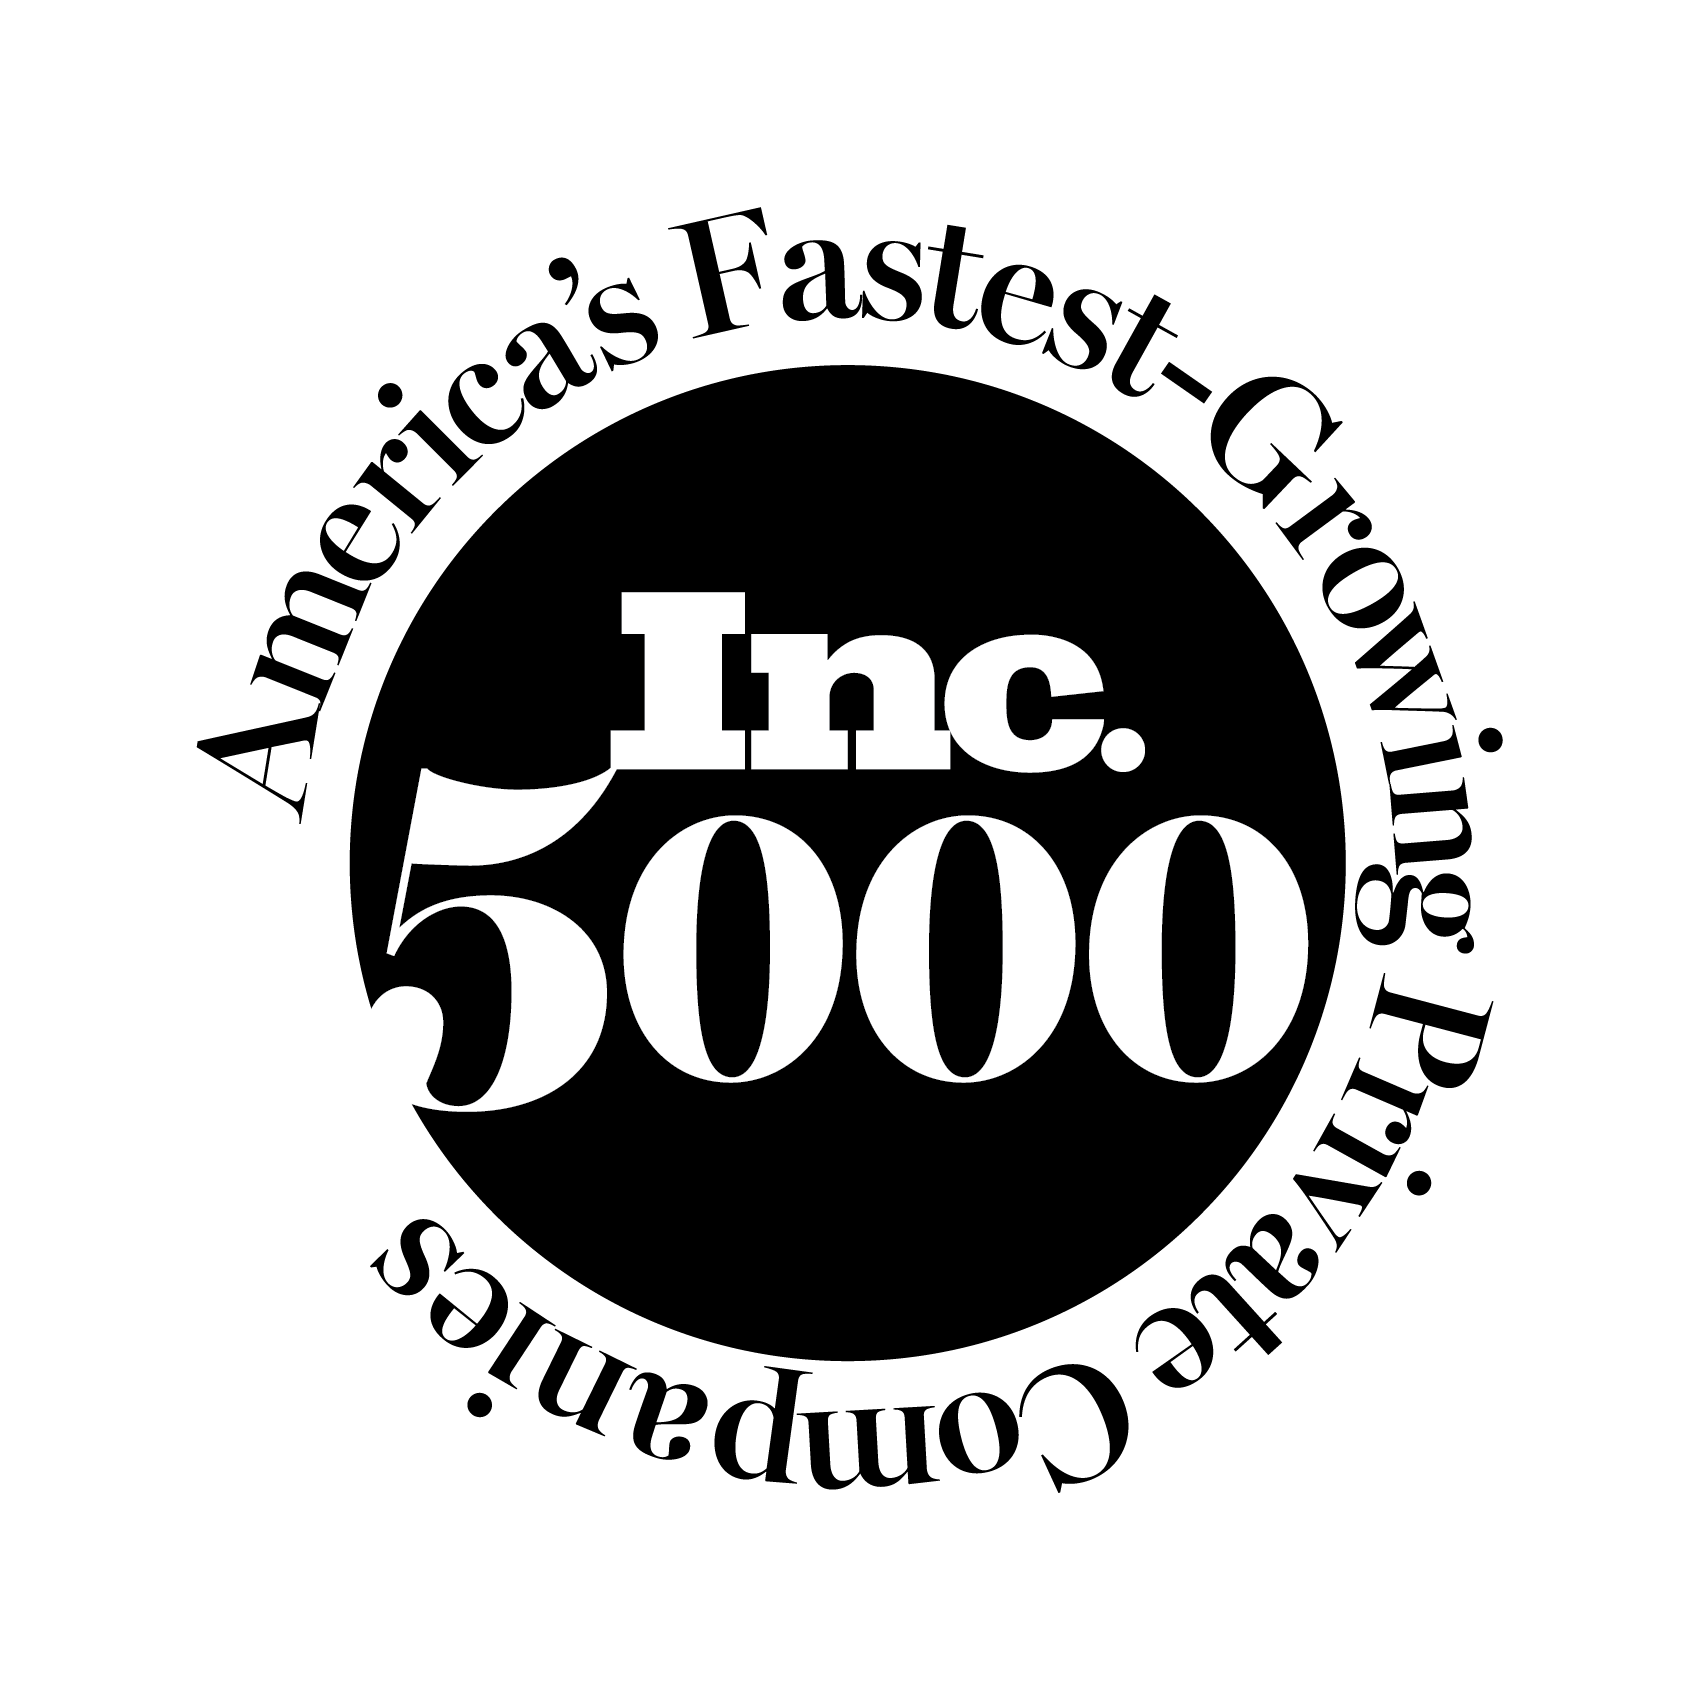 Inc.5000_CigarBand3